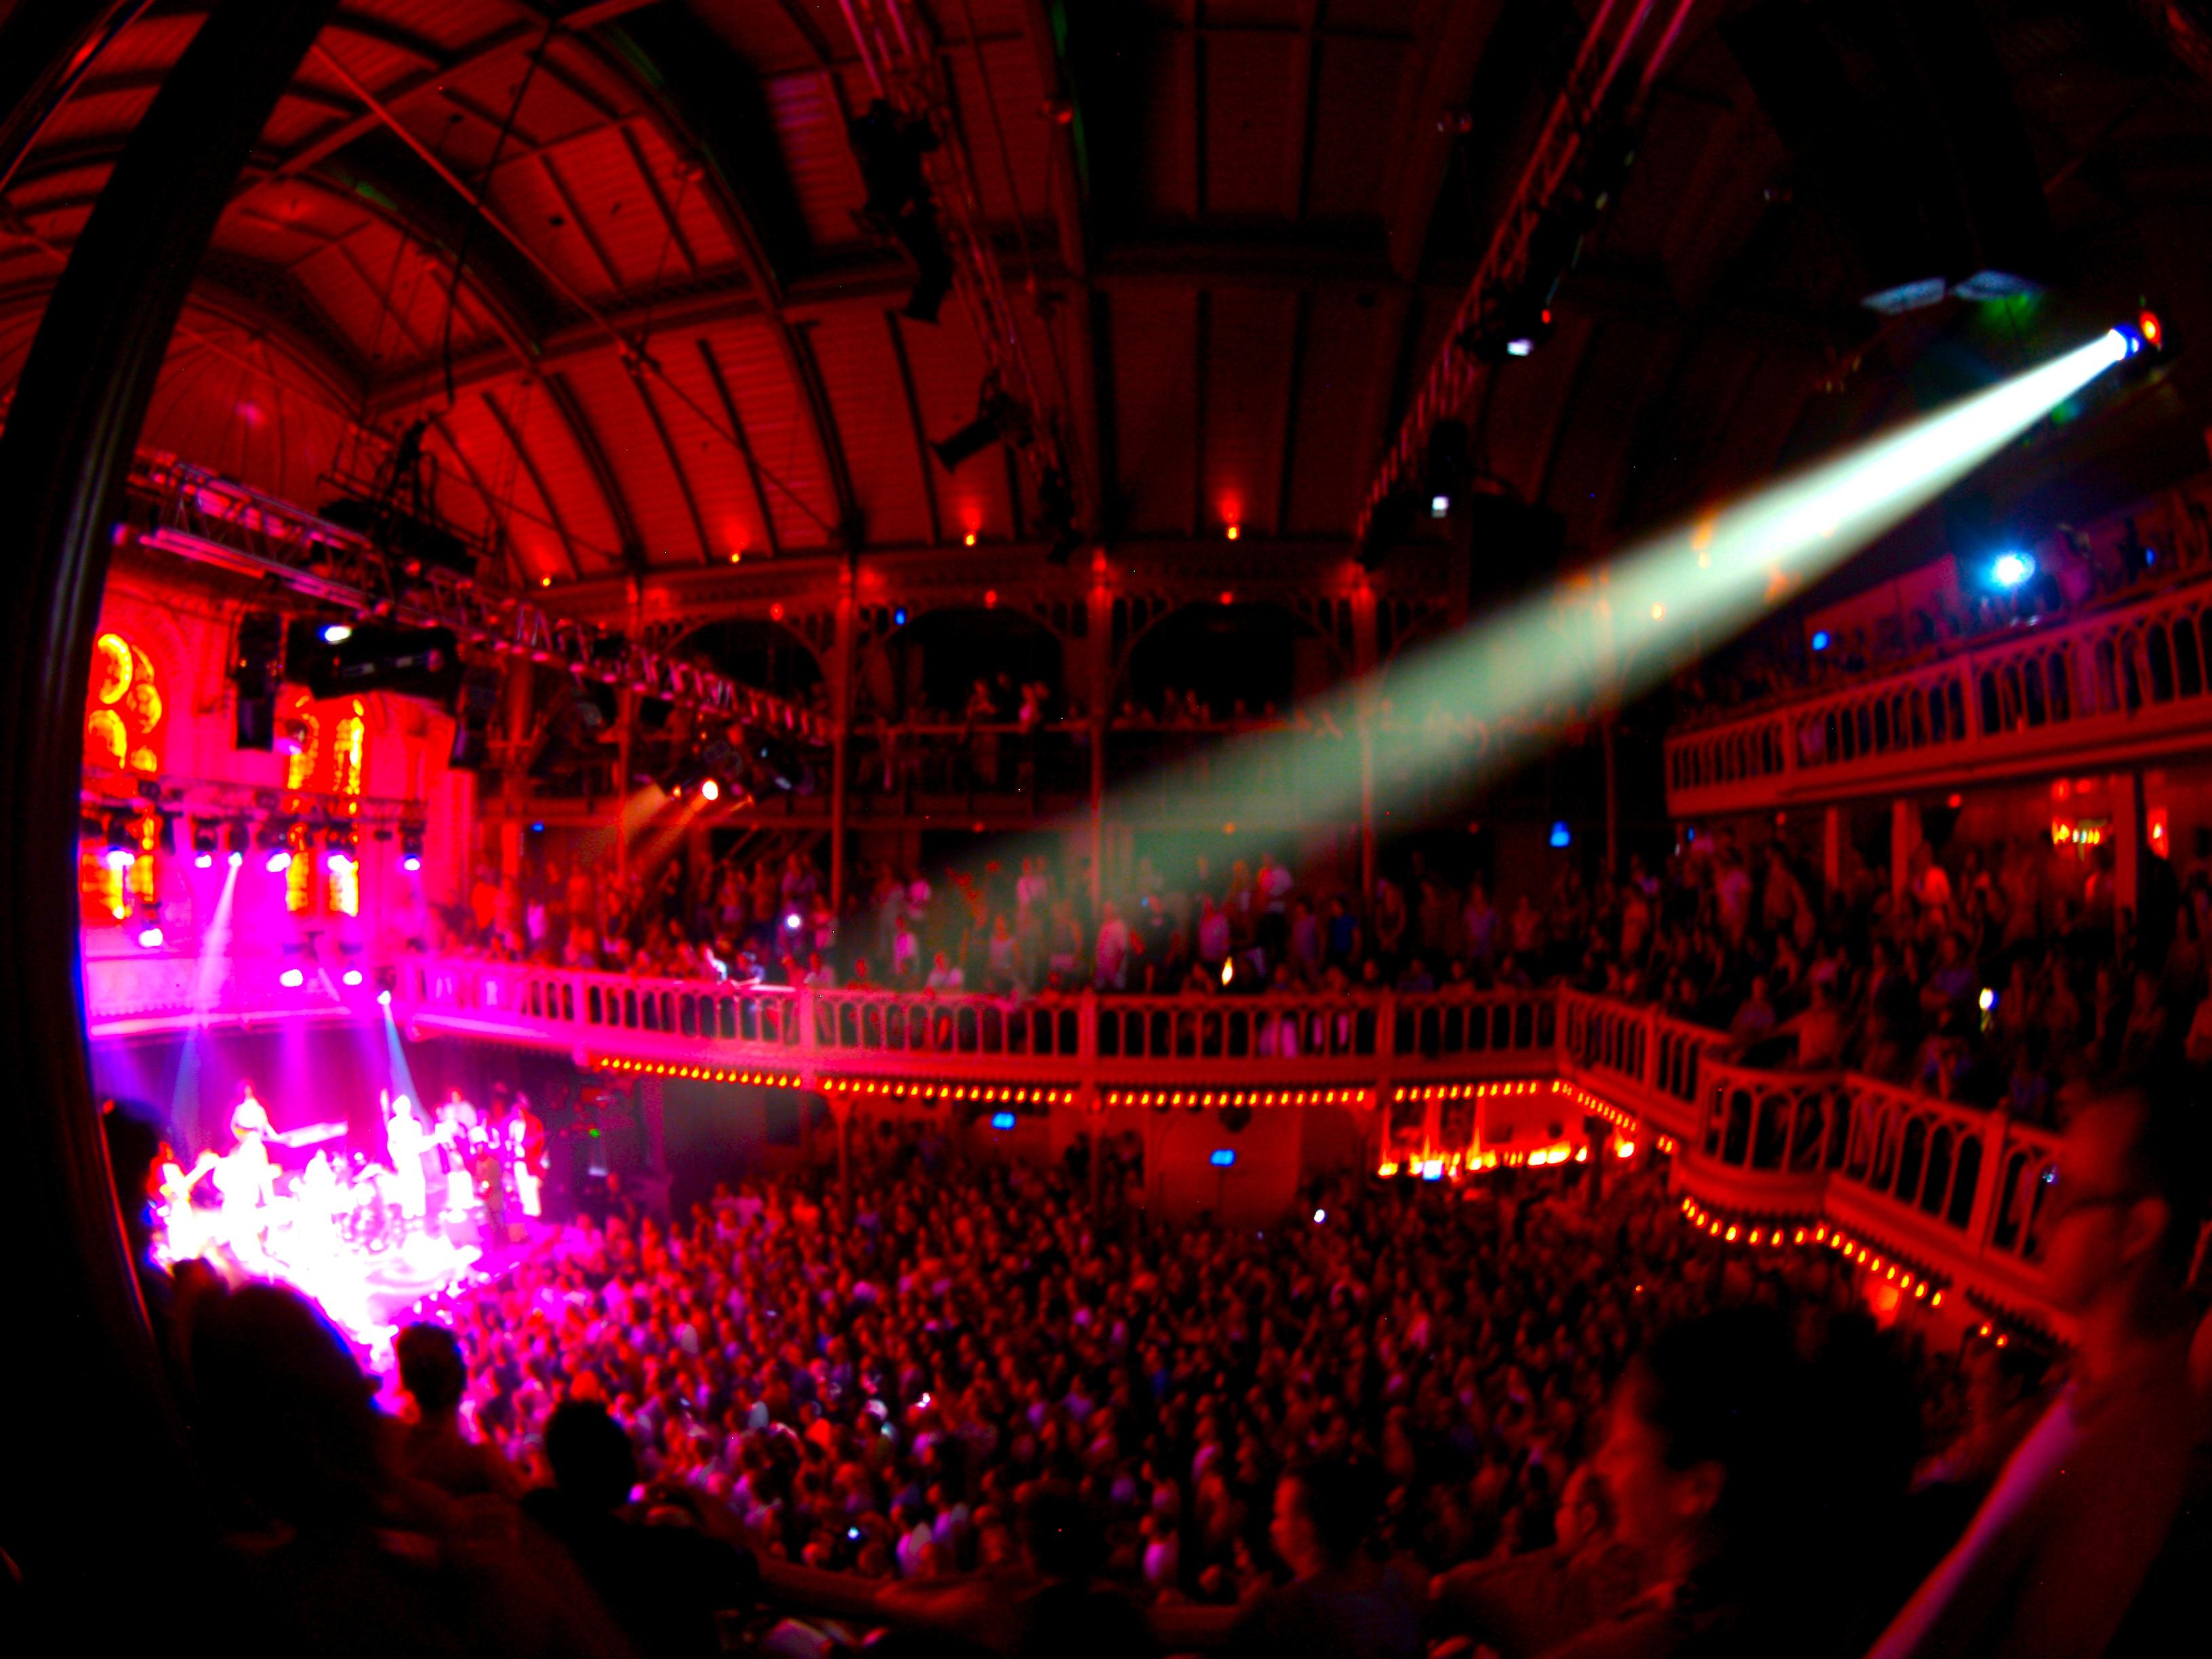 Свинг клубы в амстердаме фото 171-274